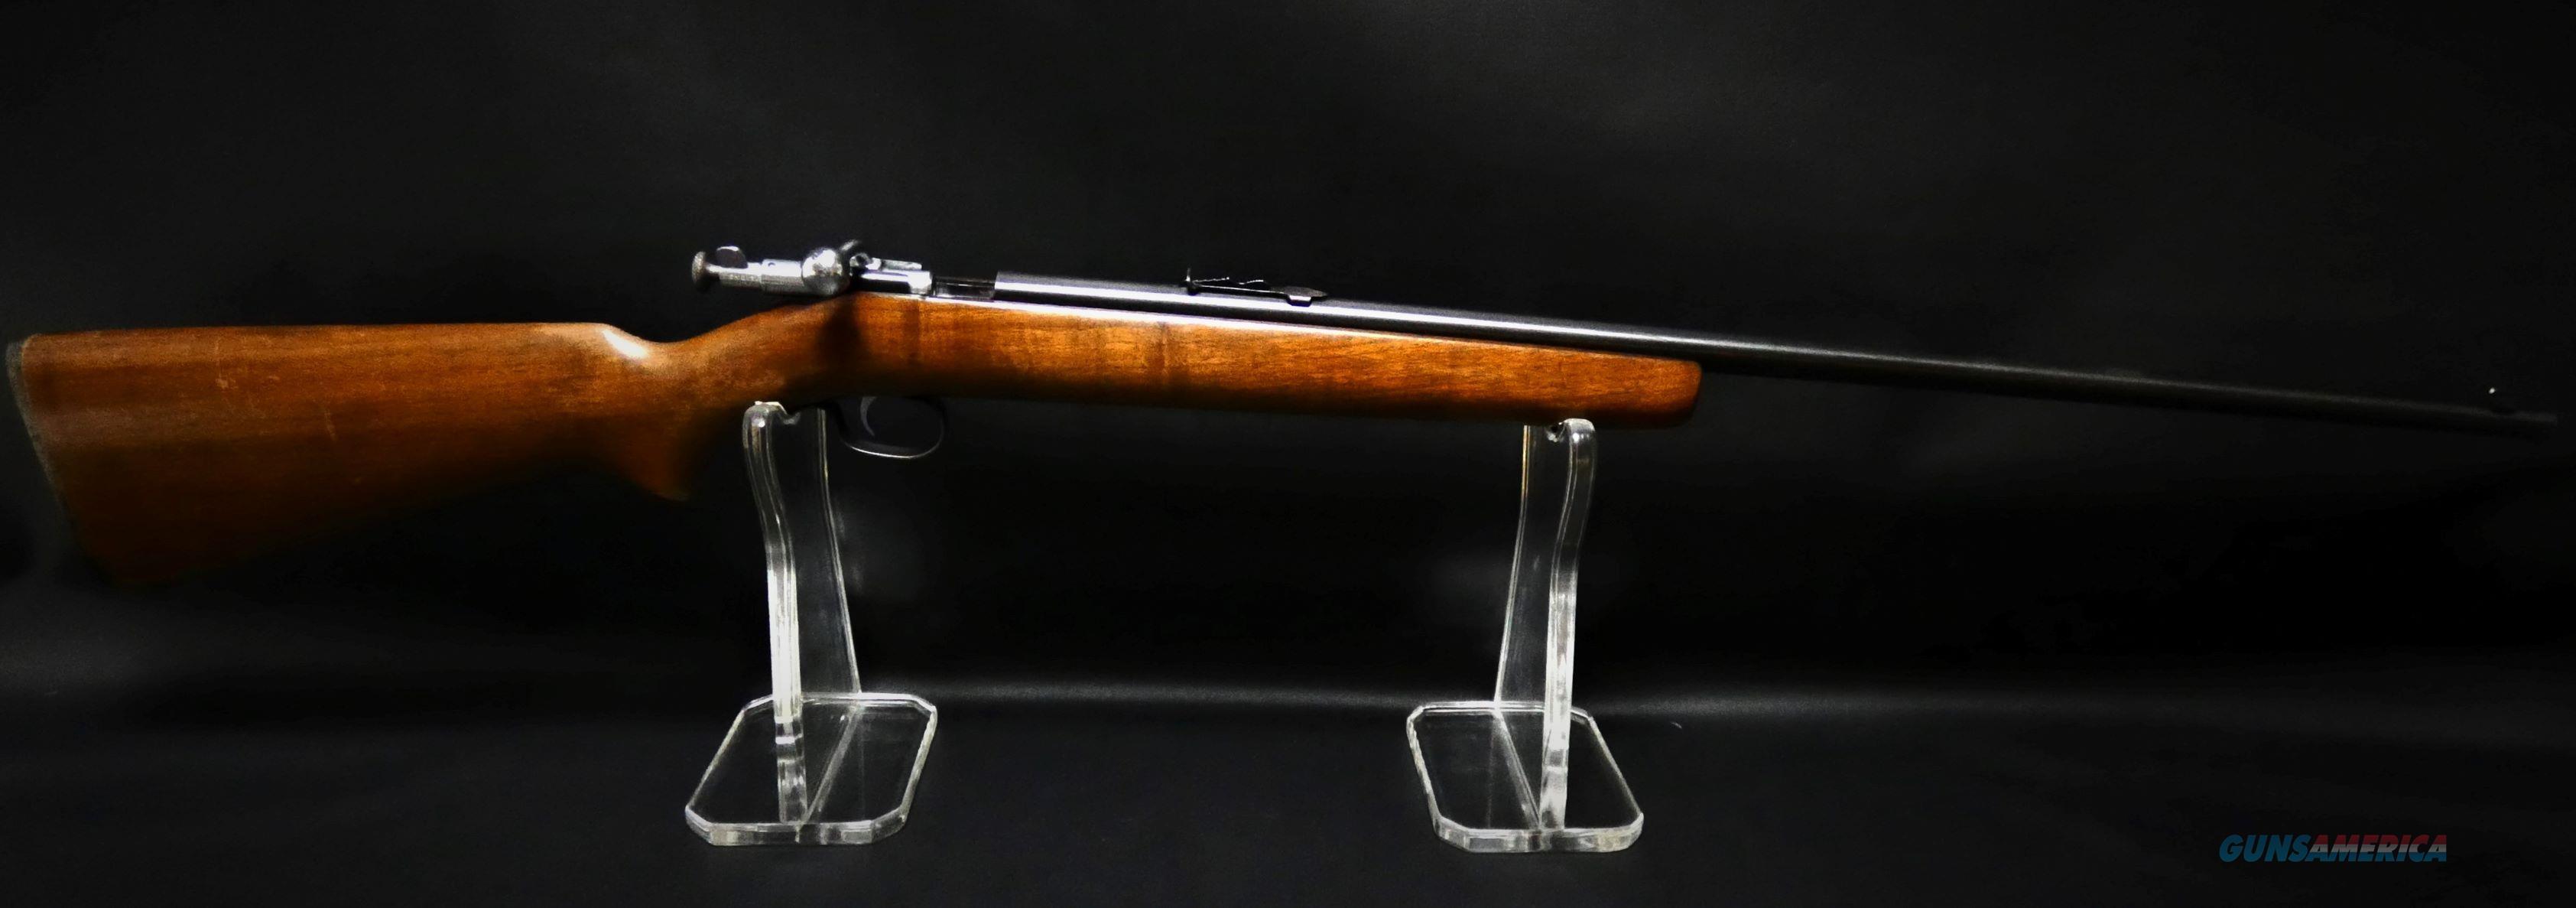 "Winchester Model 67 Single Shot .22 S,L,LR Bolt Action 27"" BBL Rifle  Guns > Rifles > Winchester Rifles - Modern Bolt/Auto/Single > Single Shot"